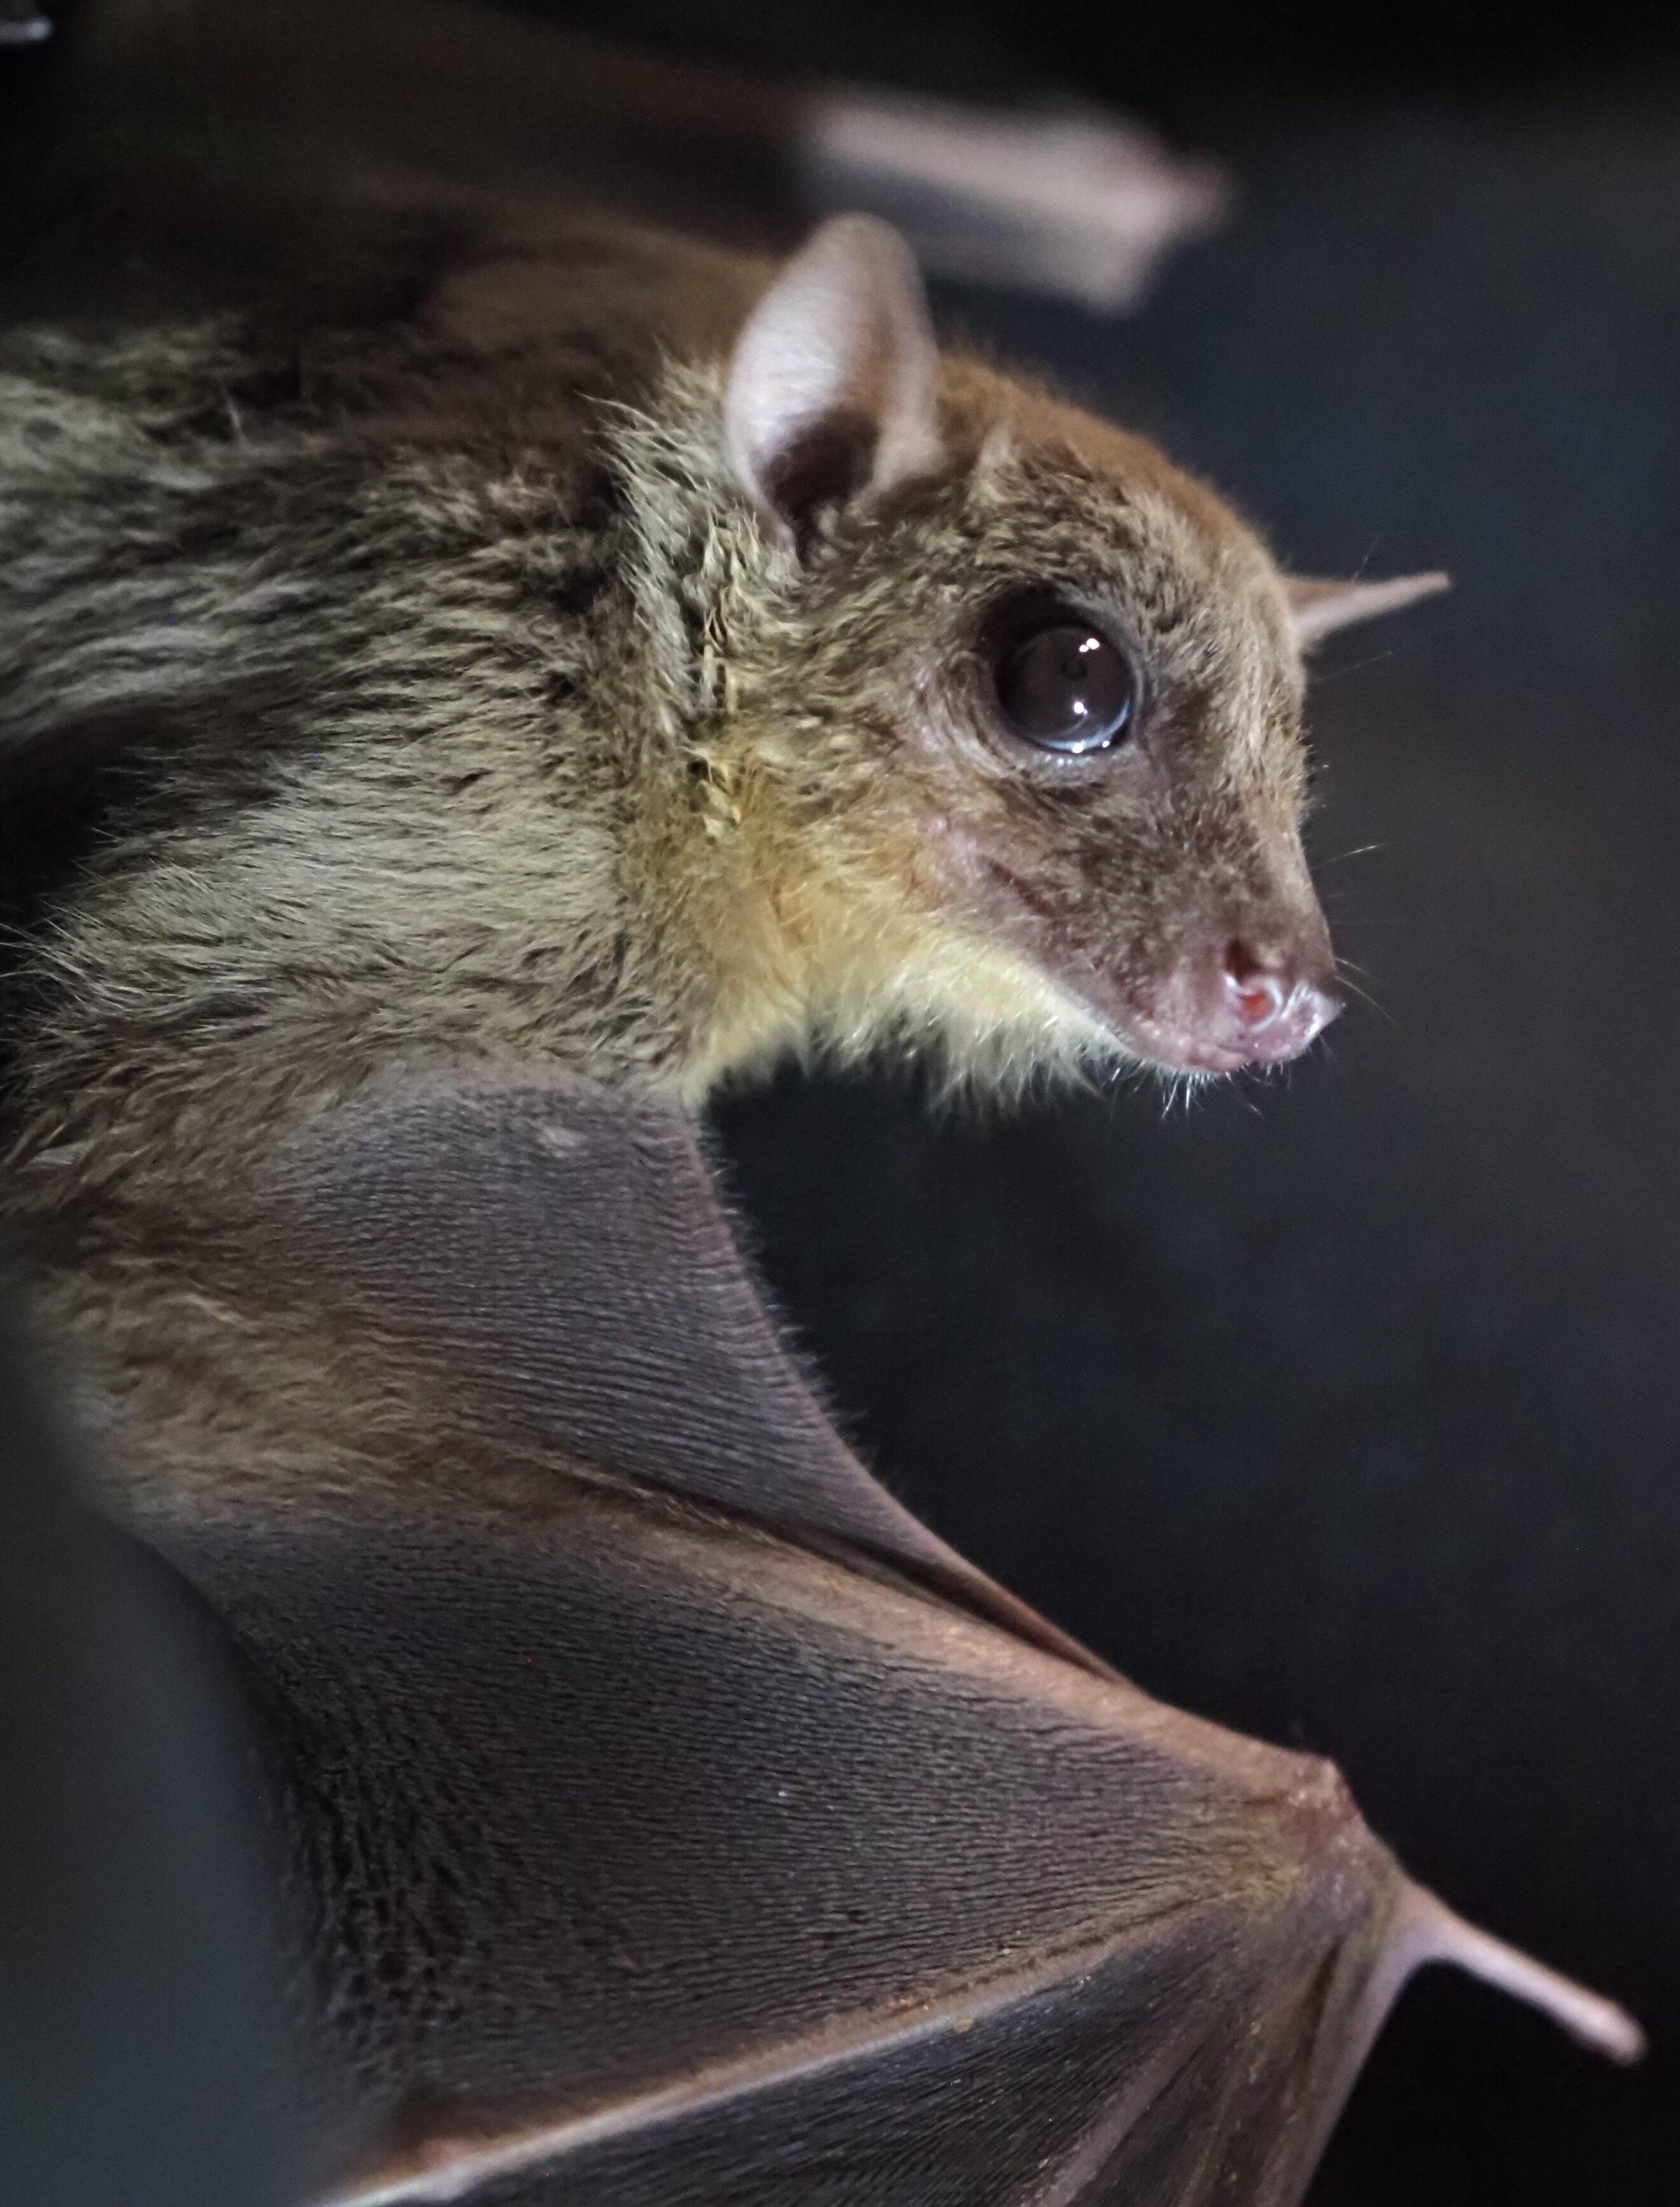 Bat study reveals secrets of the social brain